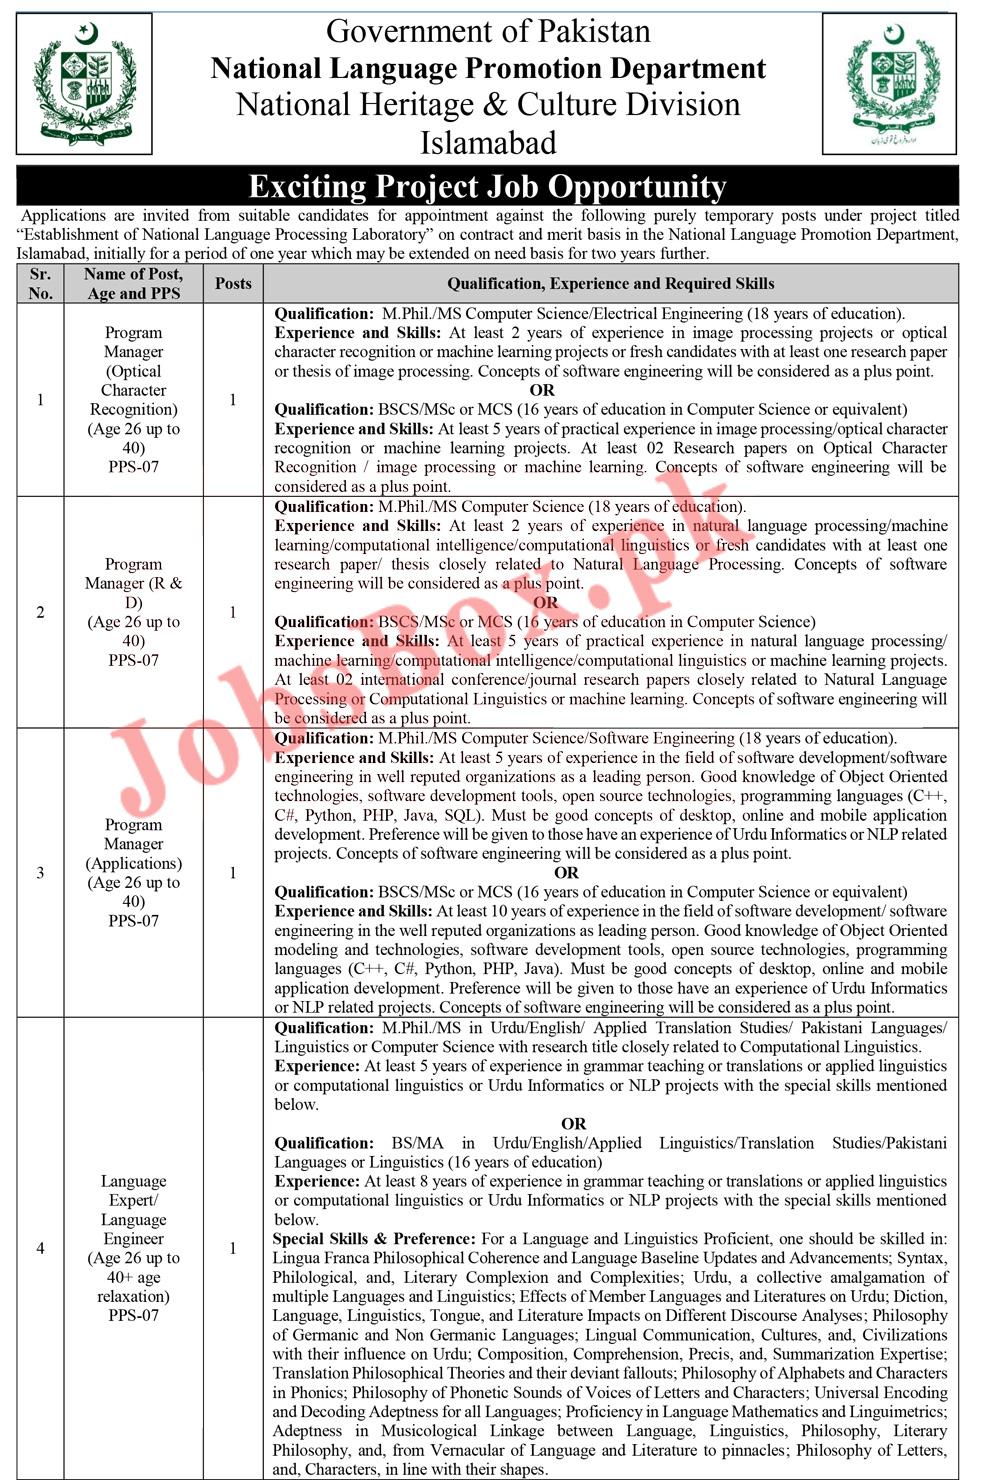 www.nlpd.gov.pk Jobs 2021 - NLPD National Language Promotion Department Jobs 2021 in Pakistan